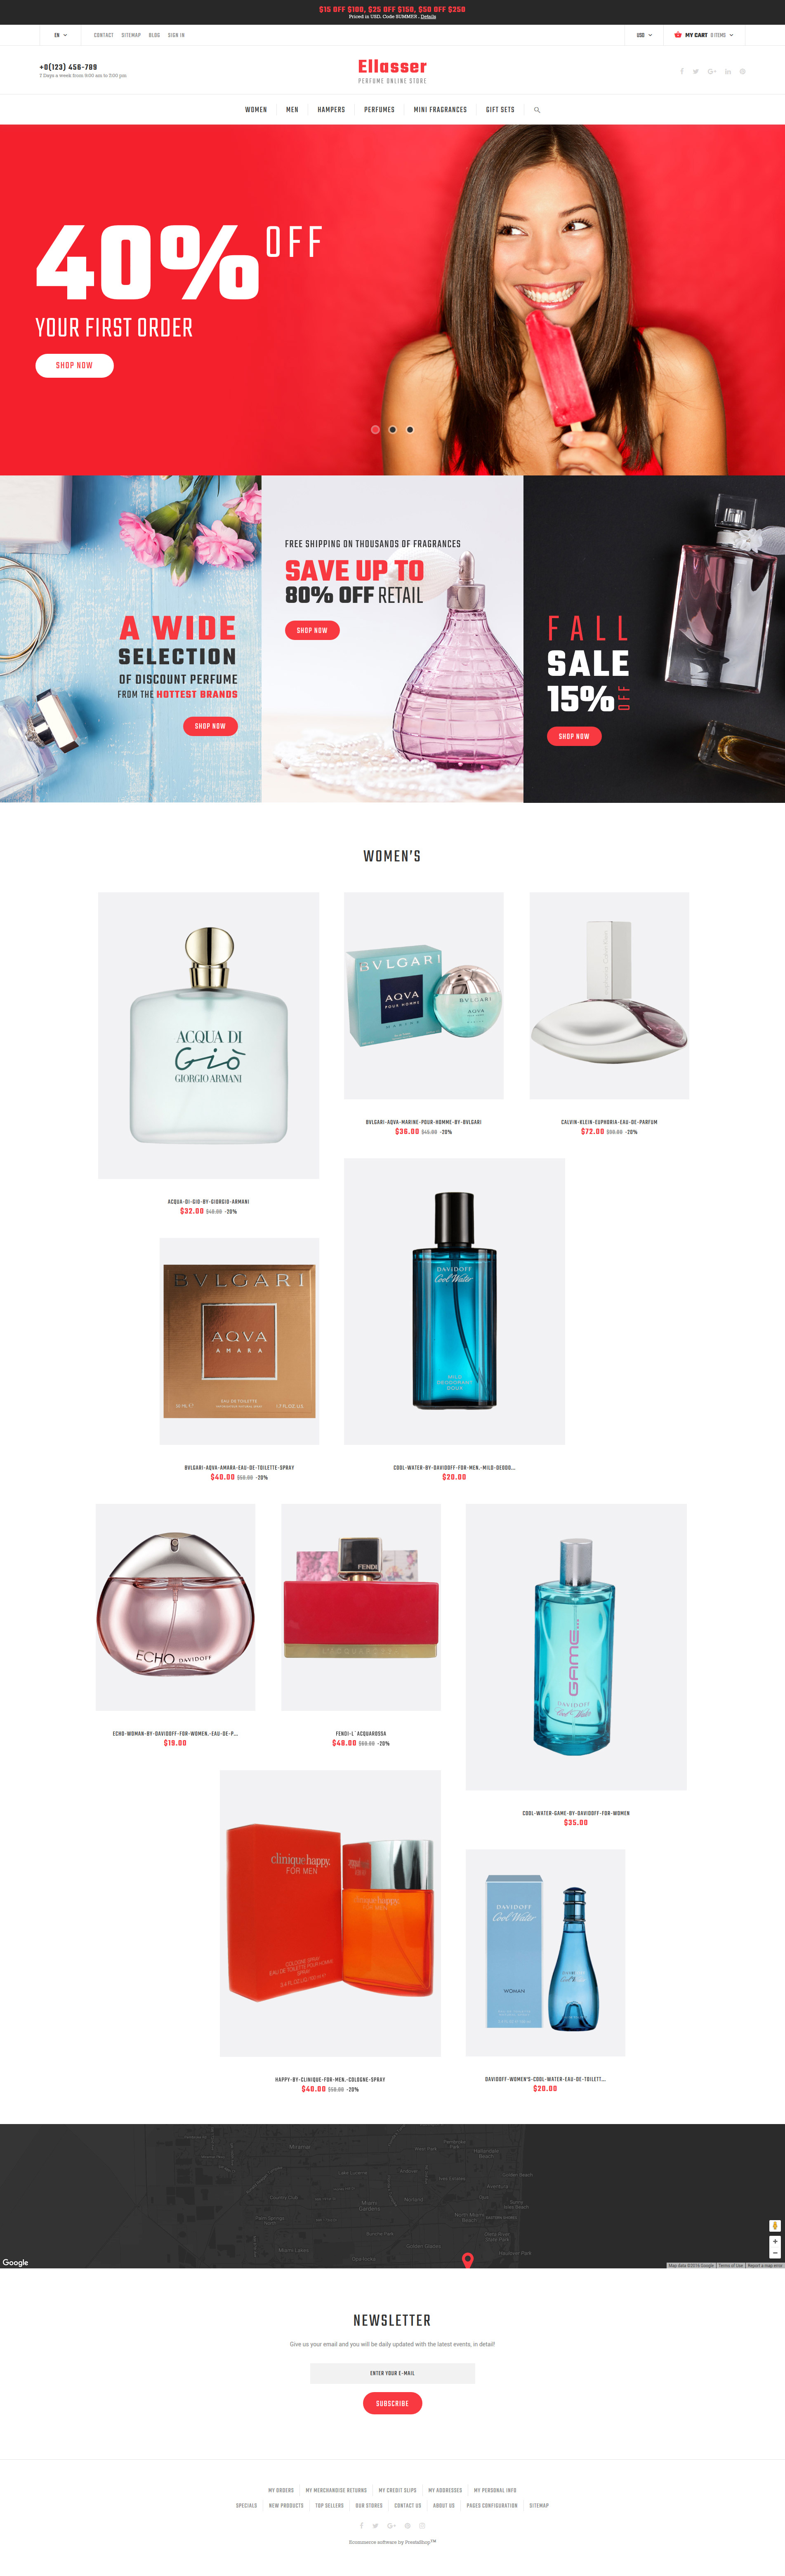 Ellasser - Perfume Online Store PrestaShop Theme